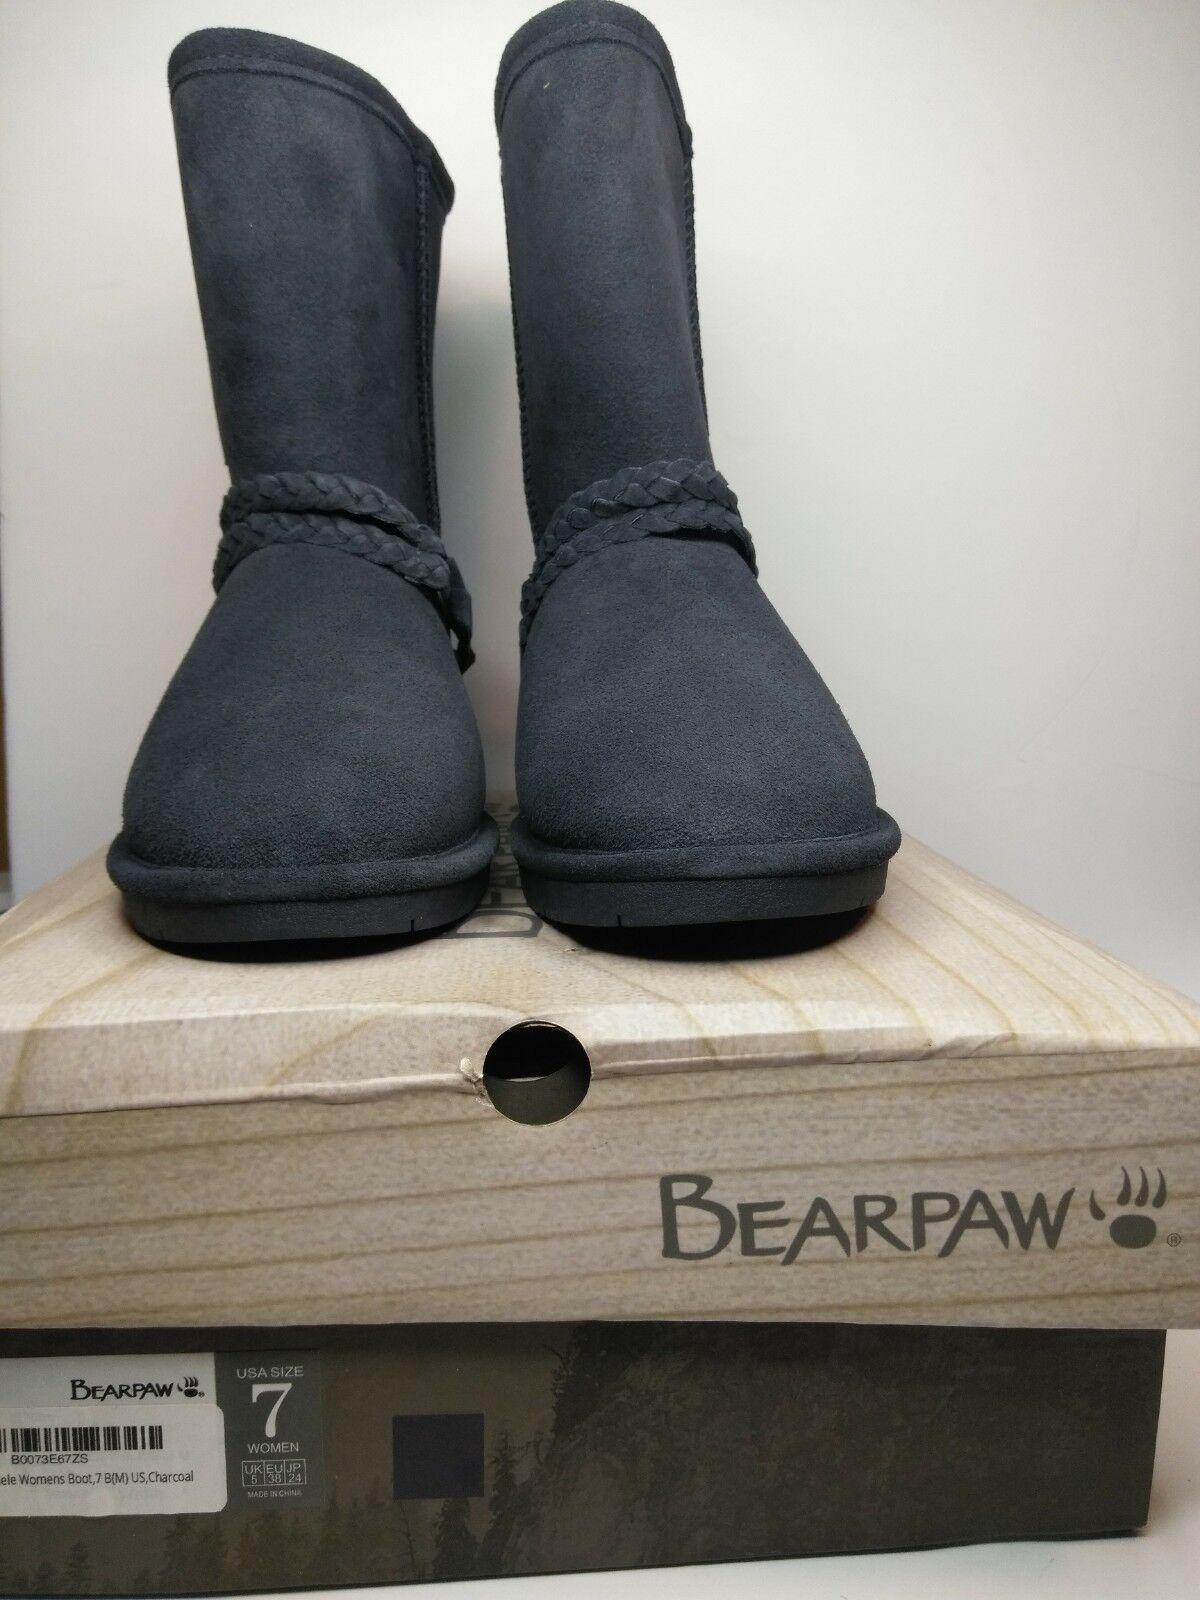 17cdee8b6d5 BEARPAW Adele Suede Sheepskin Footbed Harness Boots Charcoal 7 Strap Women s  oovswr2850-Women s Boots